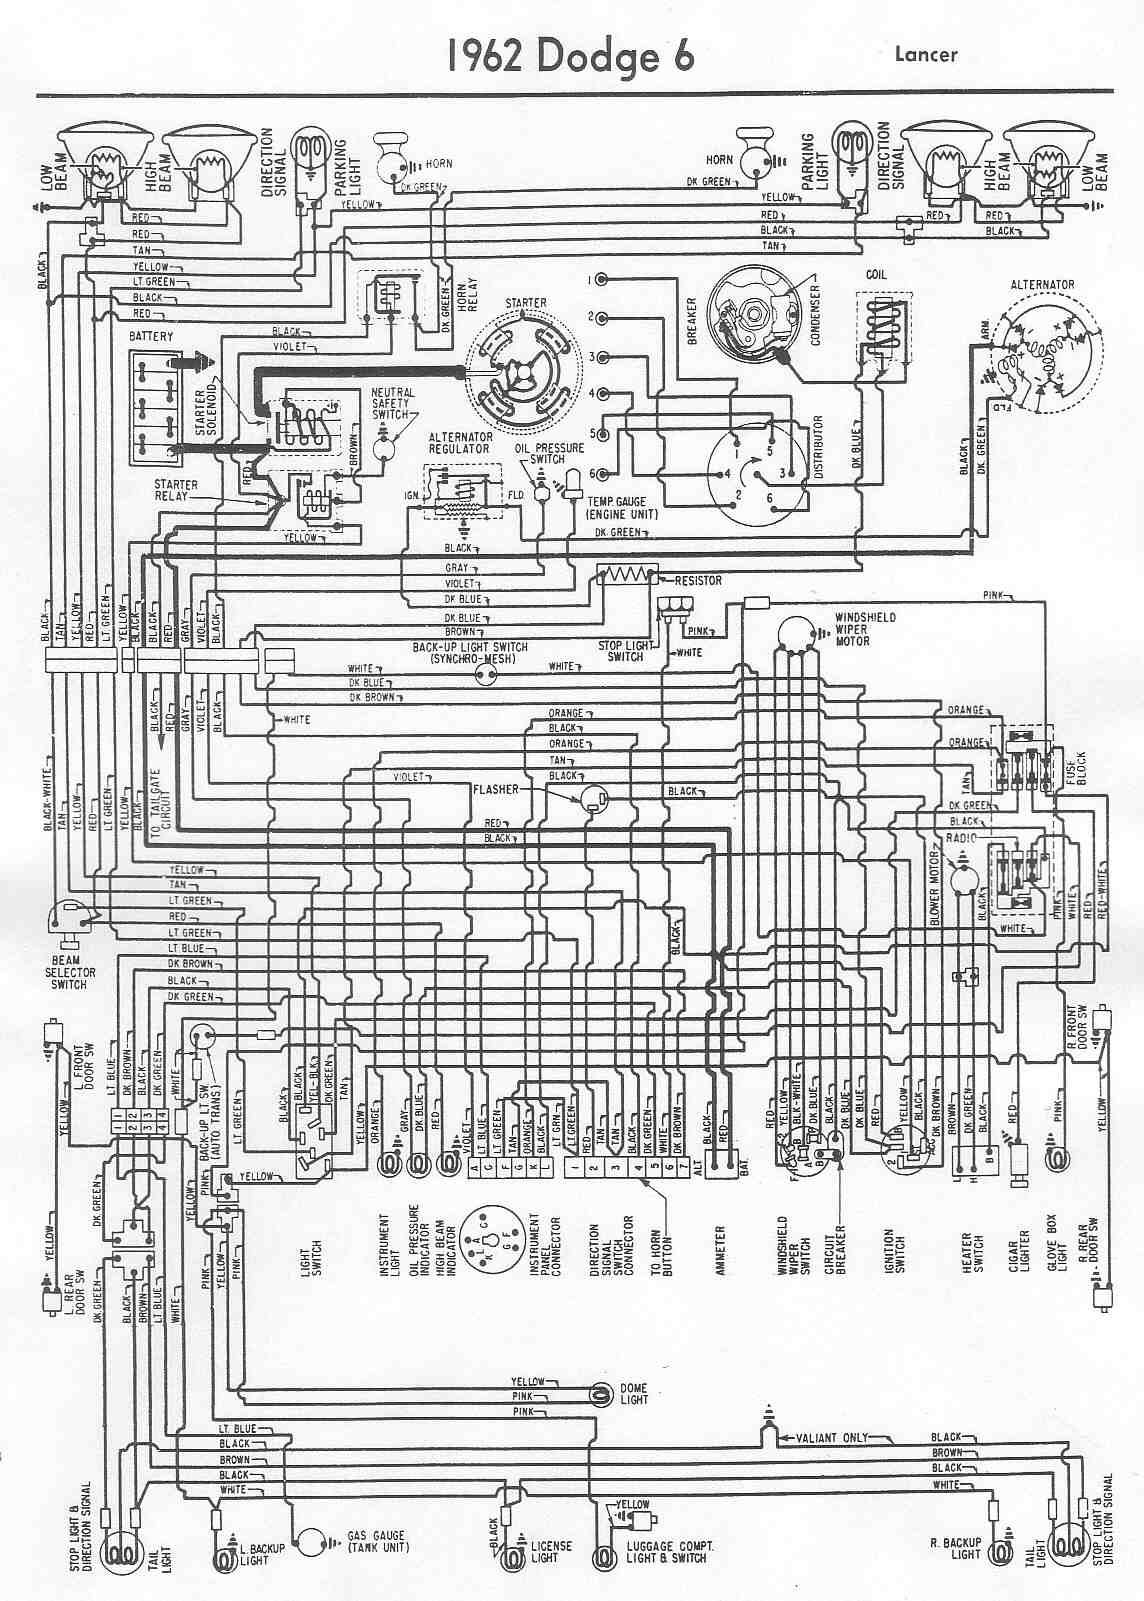 2003 Mitsubishi Lancer Wiring Harness Explained Diagrams 4g92 Diagram Pdf Smart U2022 Ford F 150